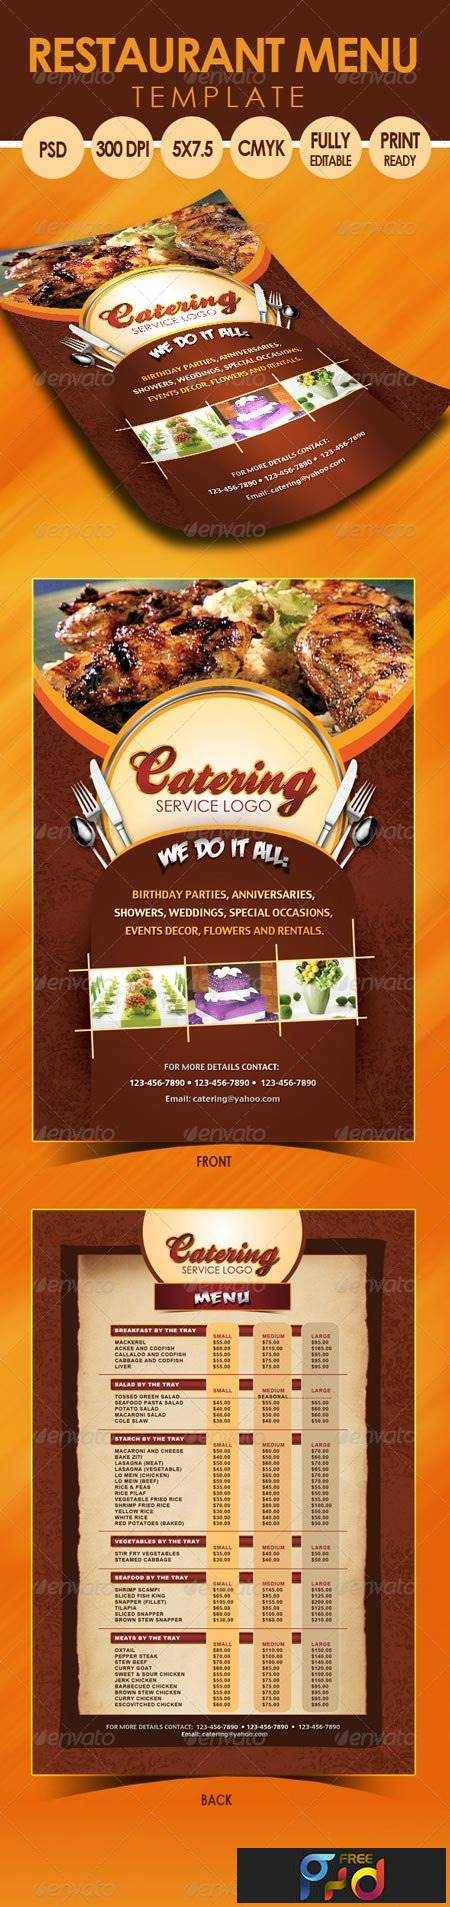 freepsdvn-com_1412121607_catering-menu-template-flyer-3318145